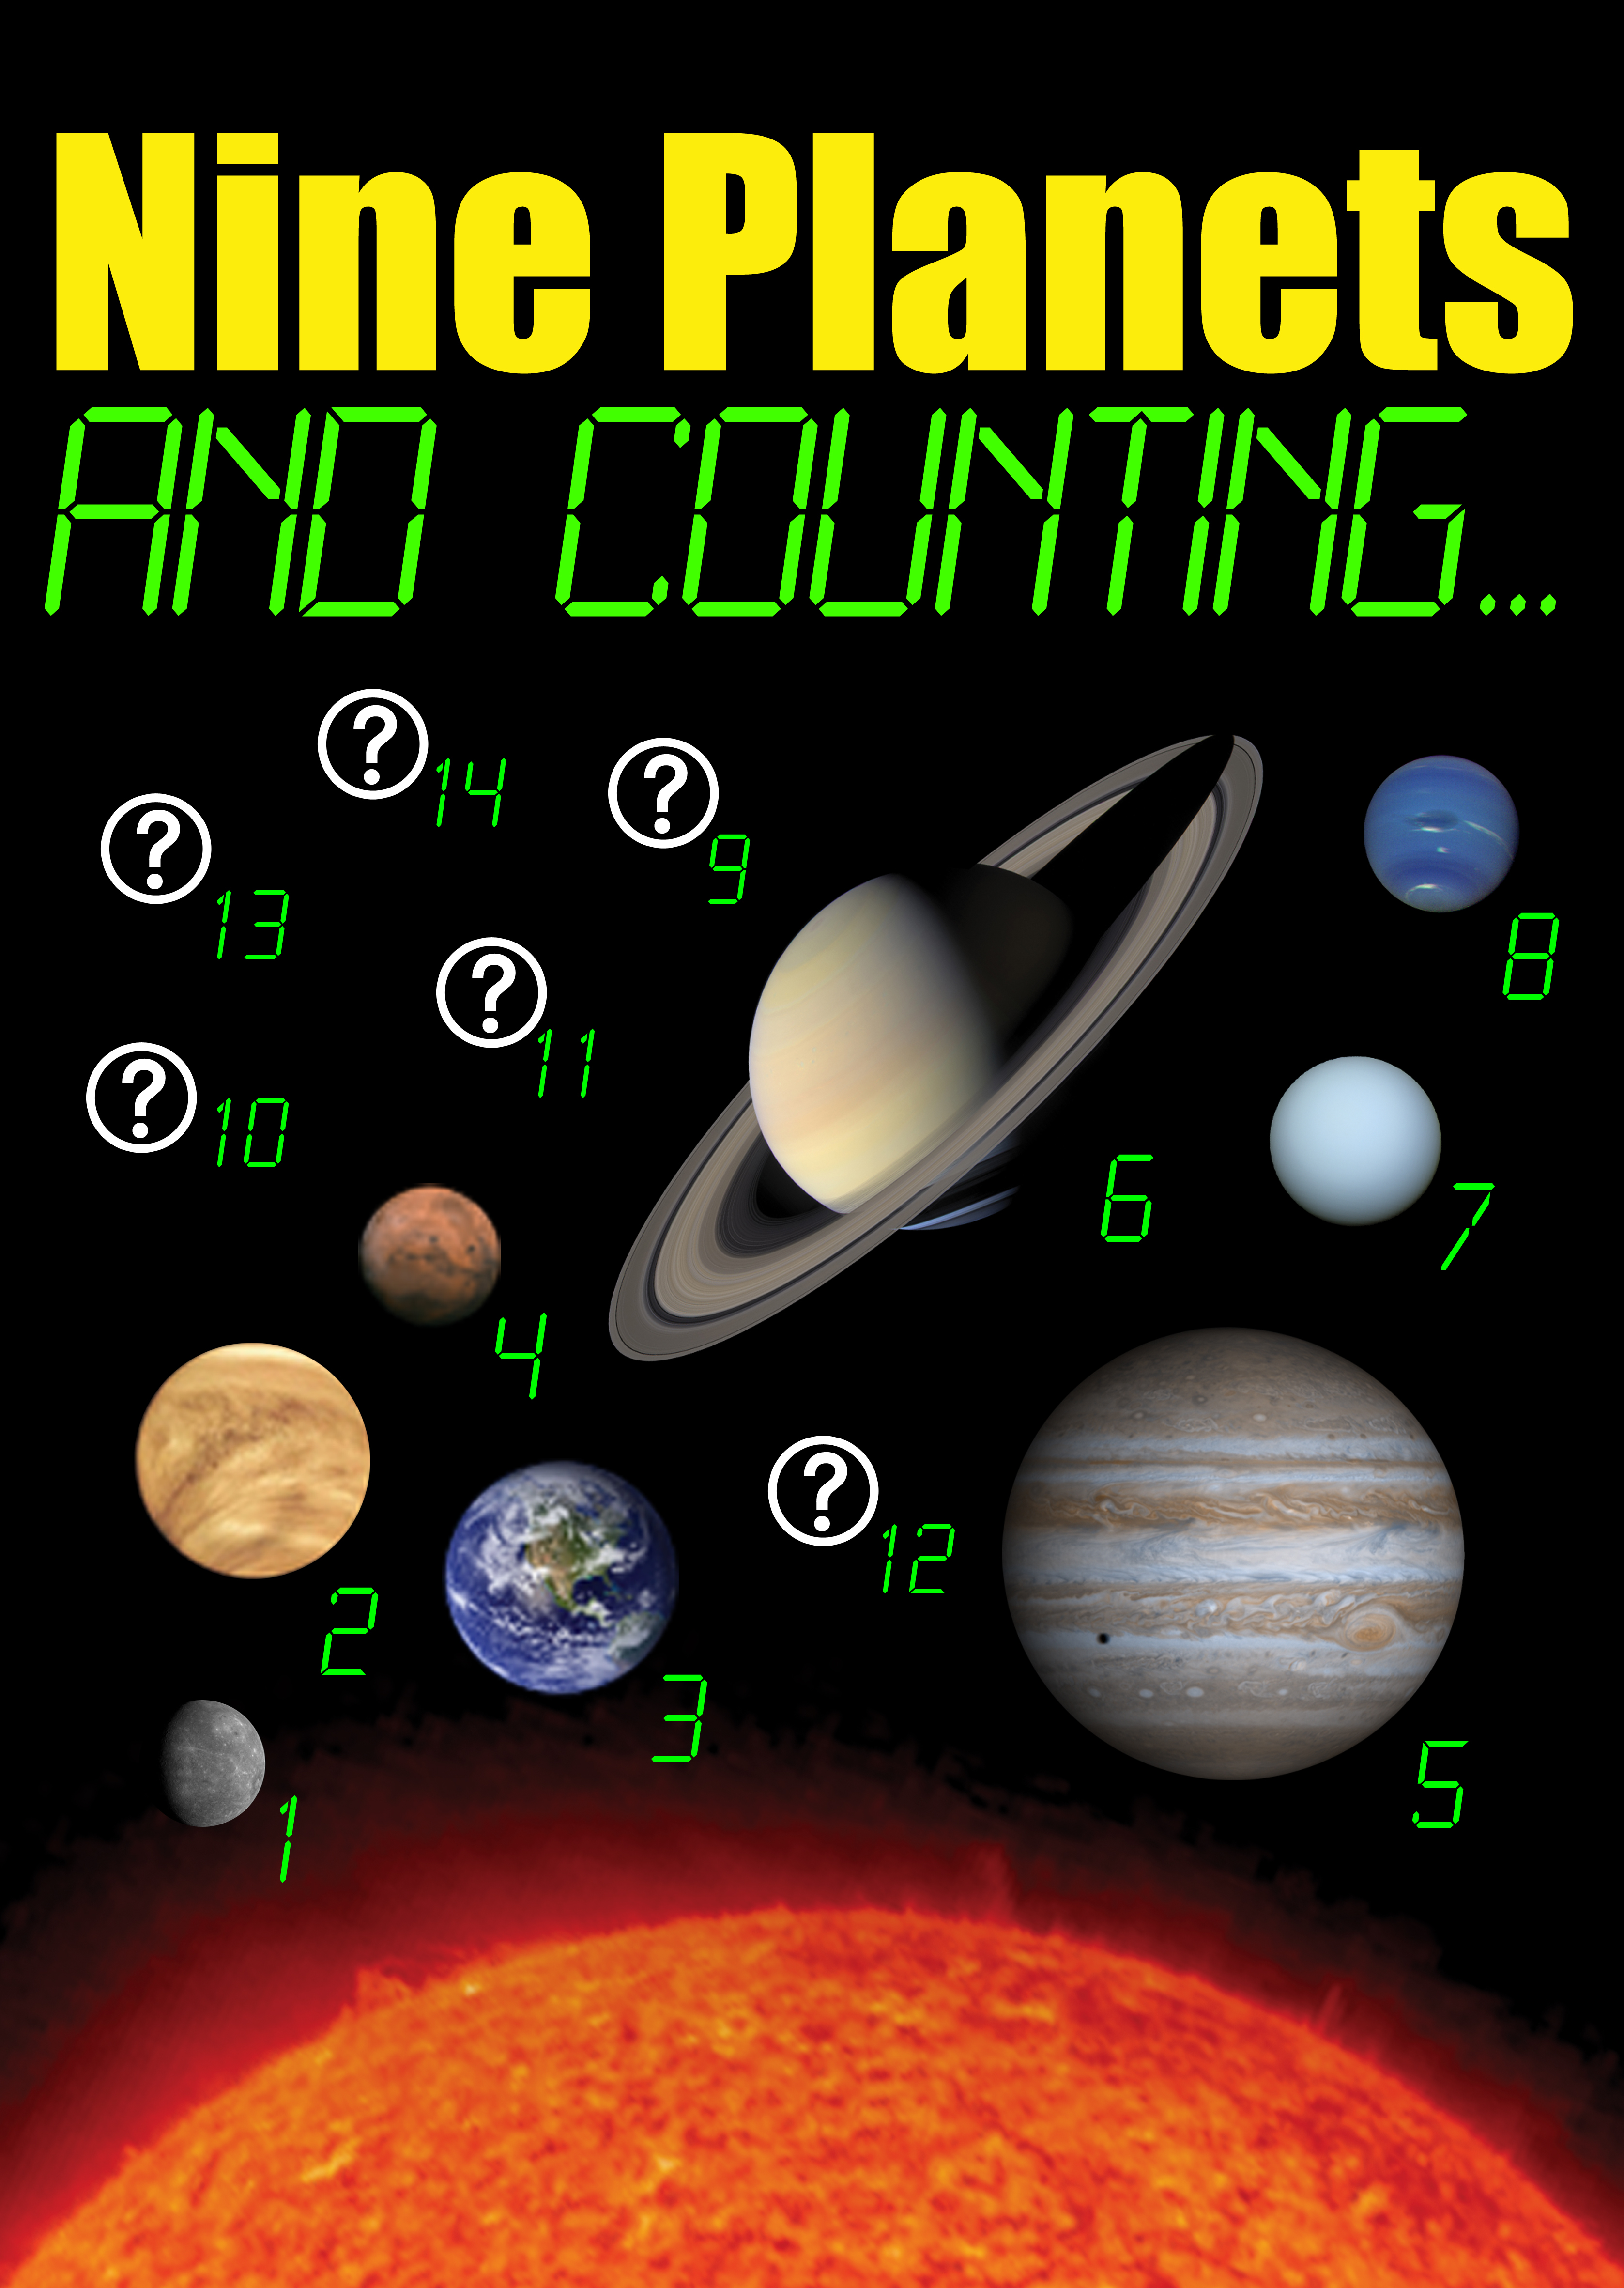 nine planets pluto - photo #29